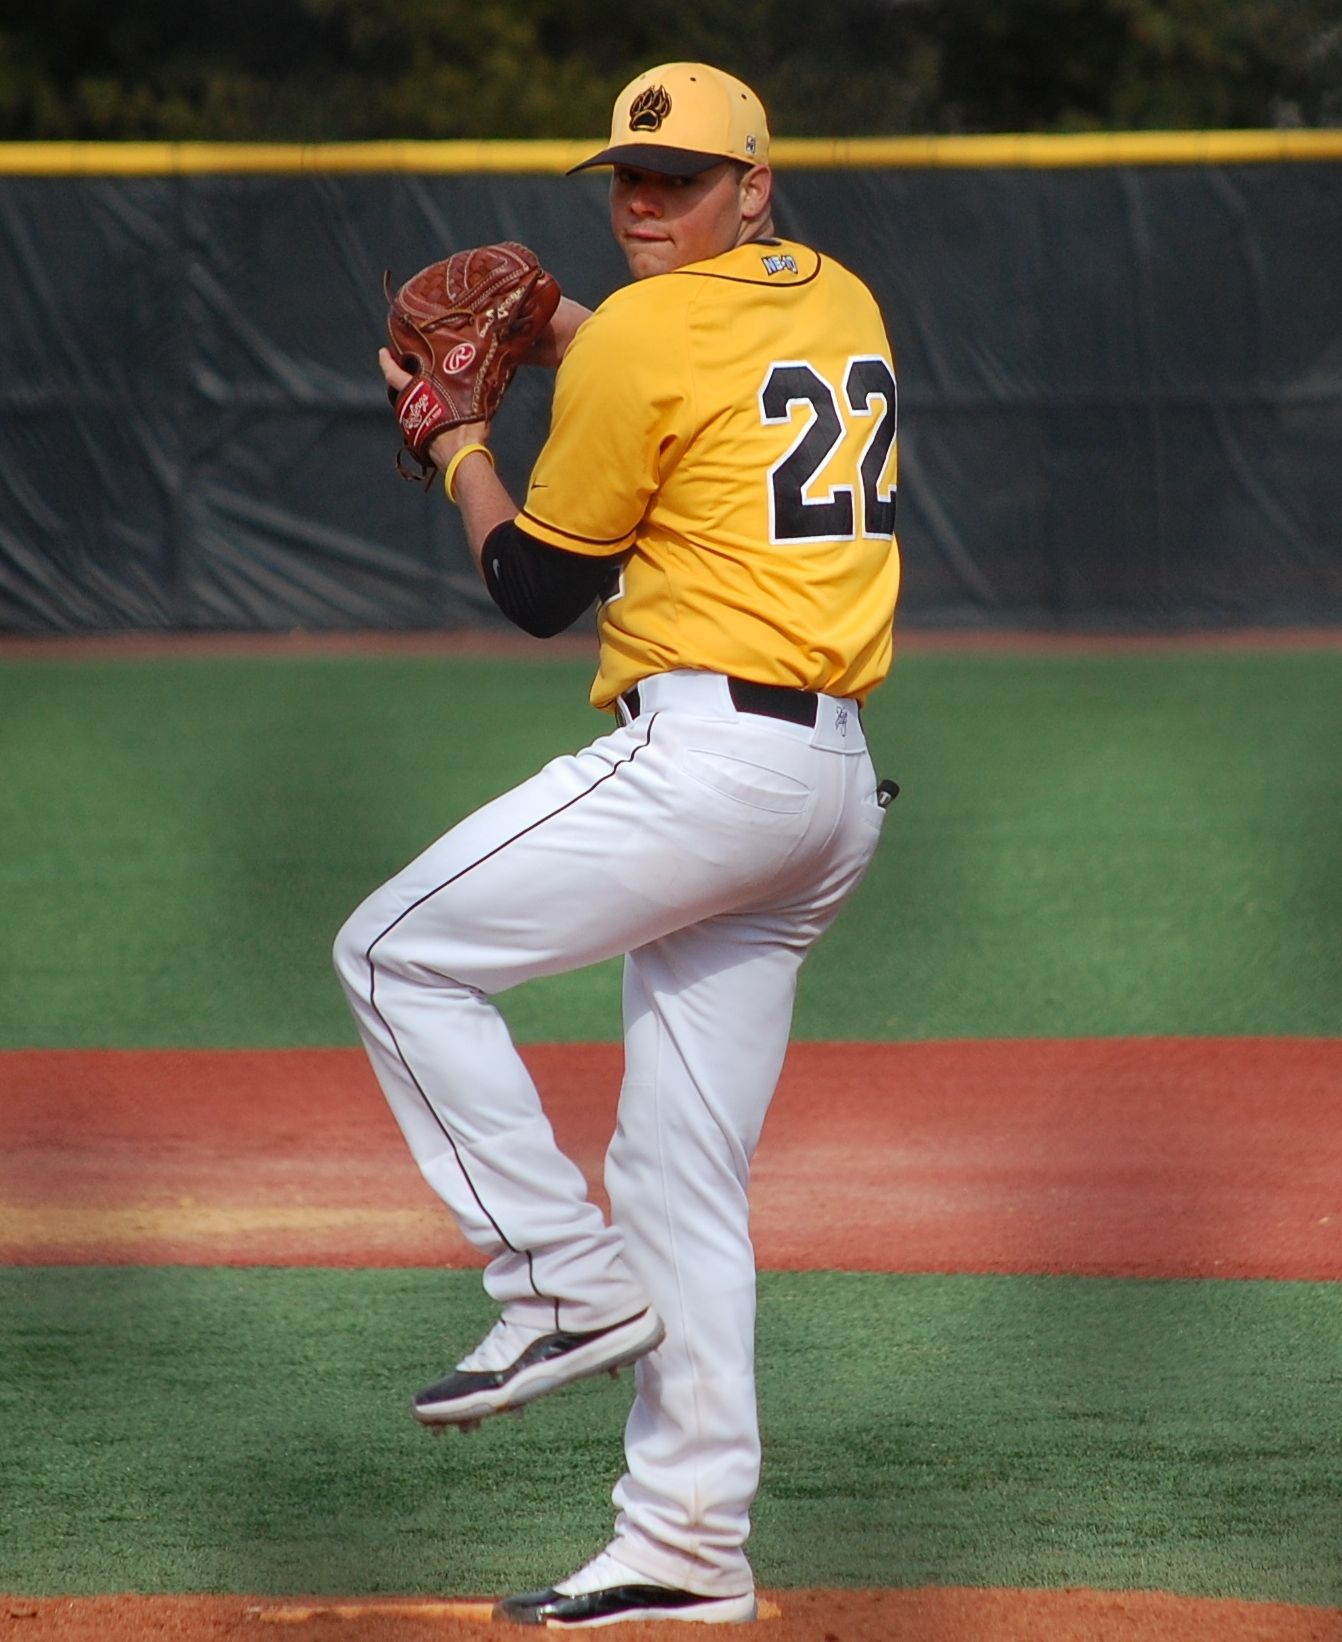 Centerville, Mass. Adelphi University baseball players